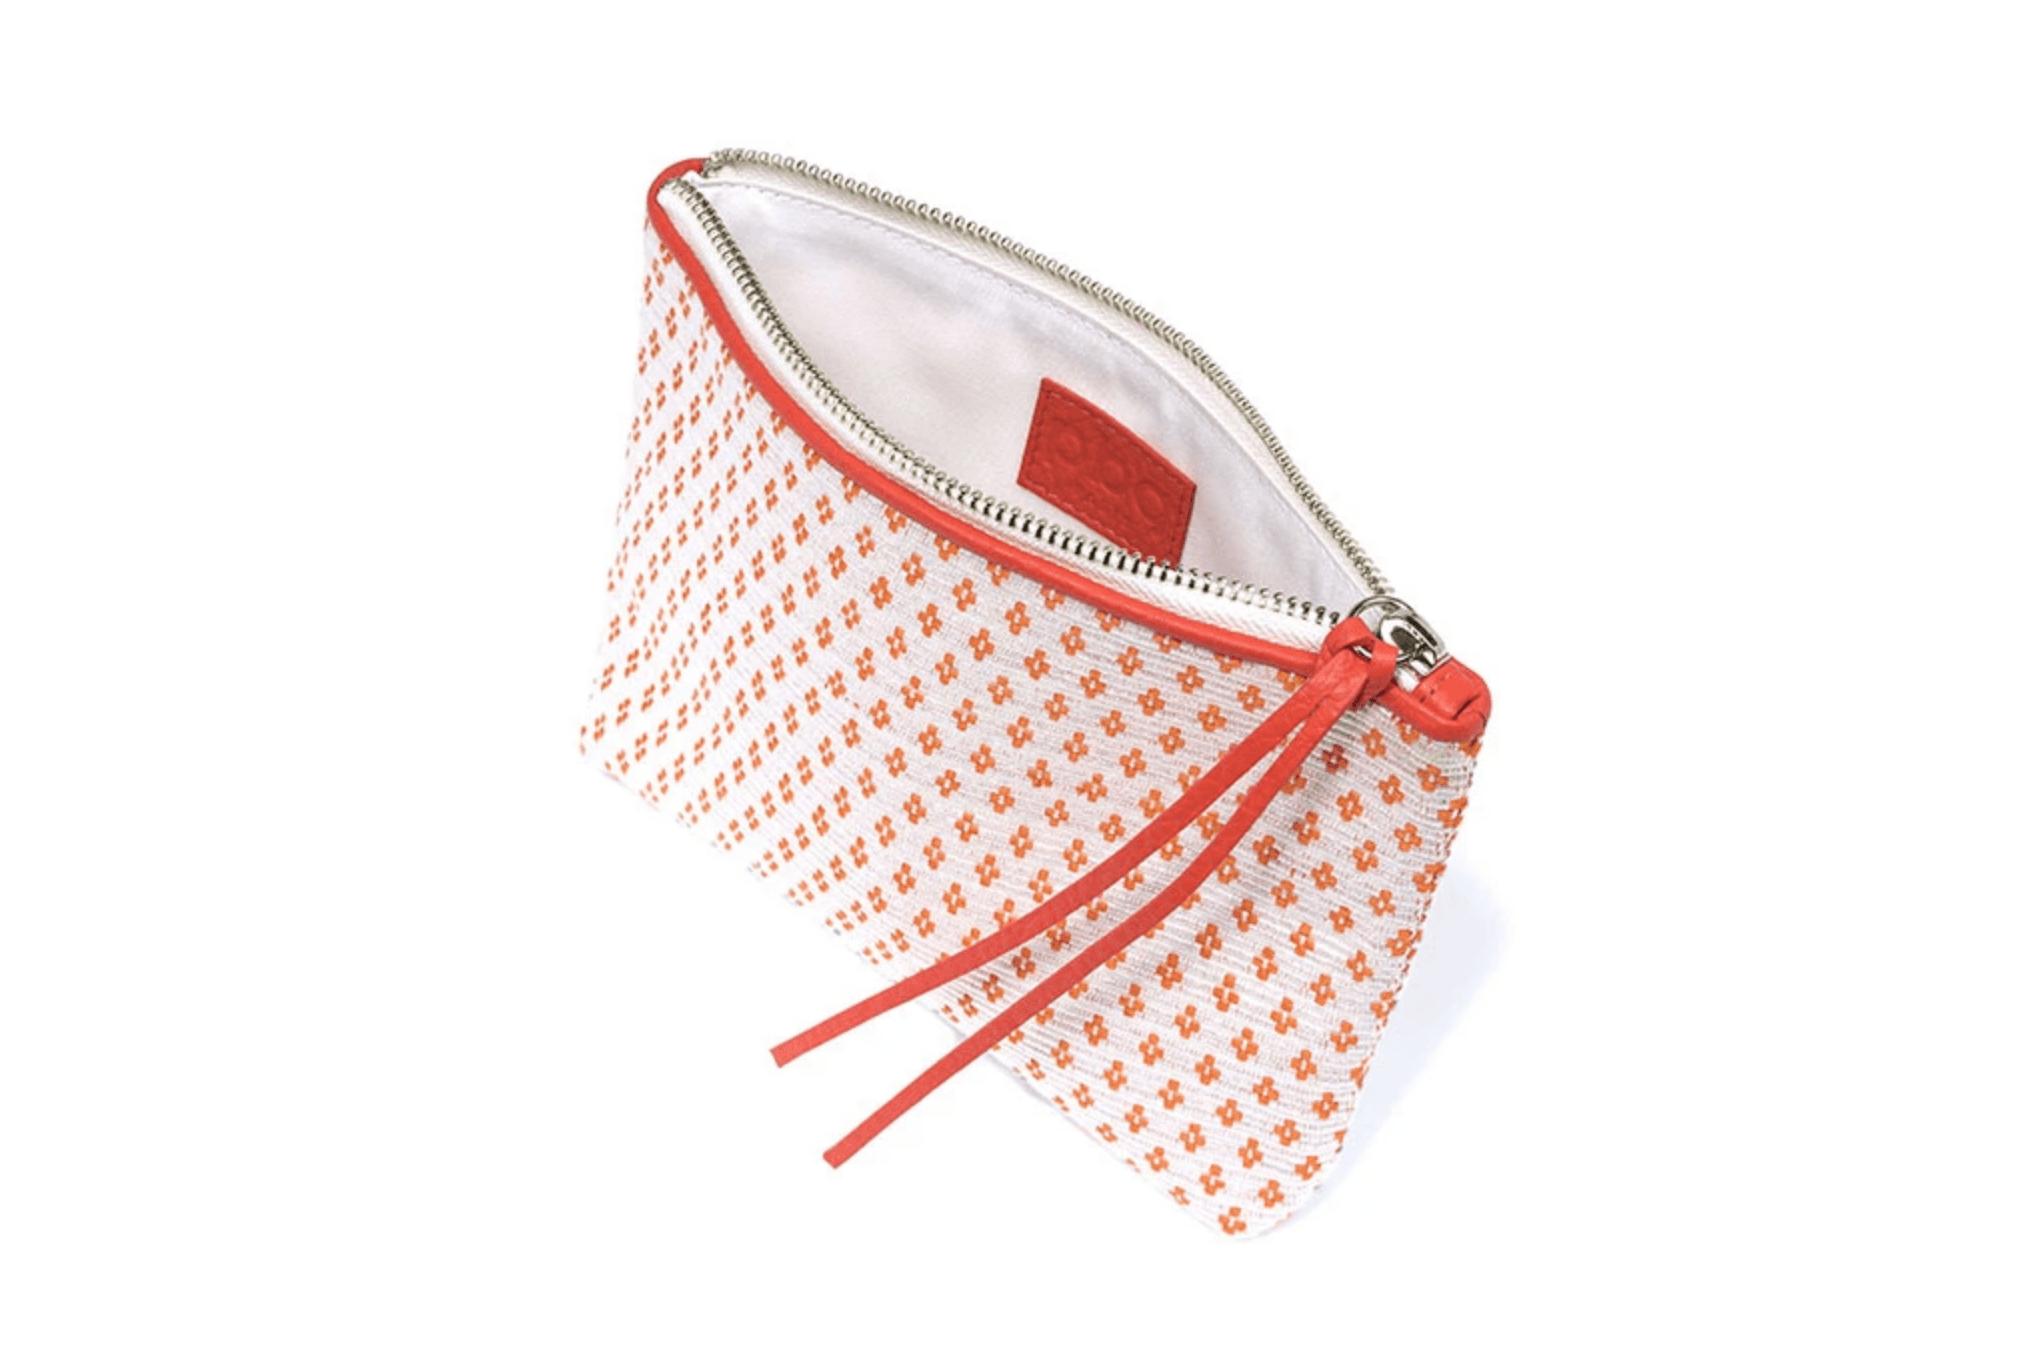 PBG PARIS-Bags of Hope zipper pouch